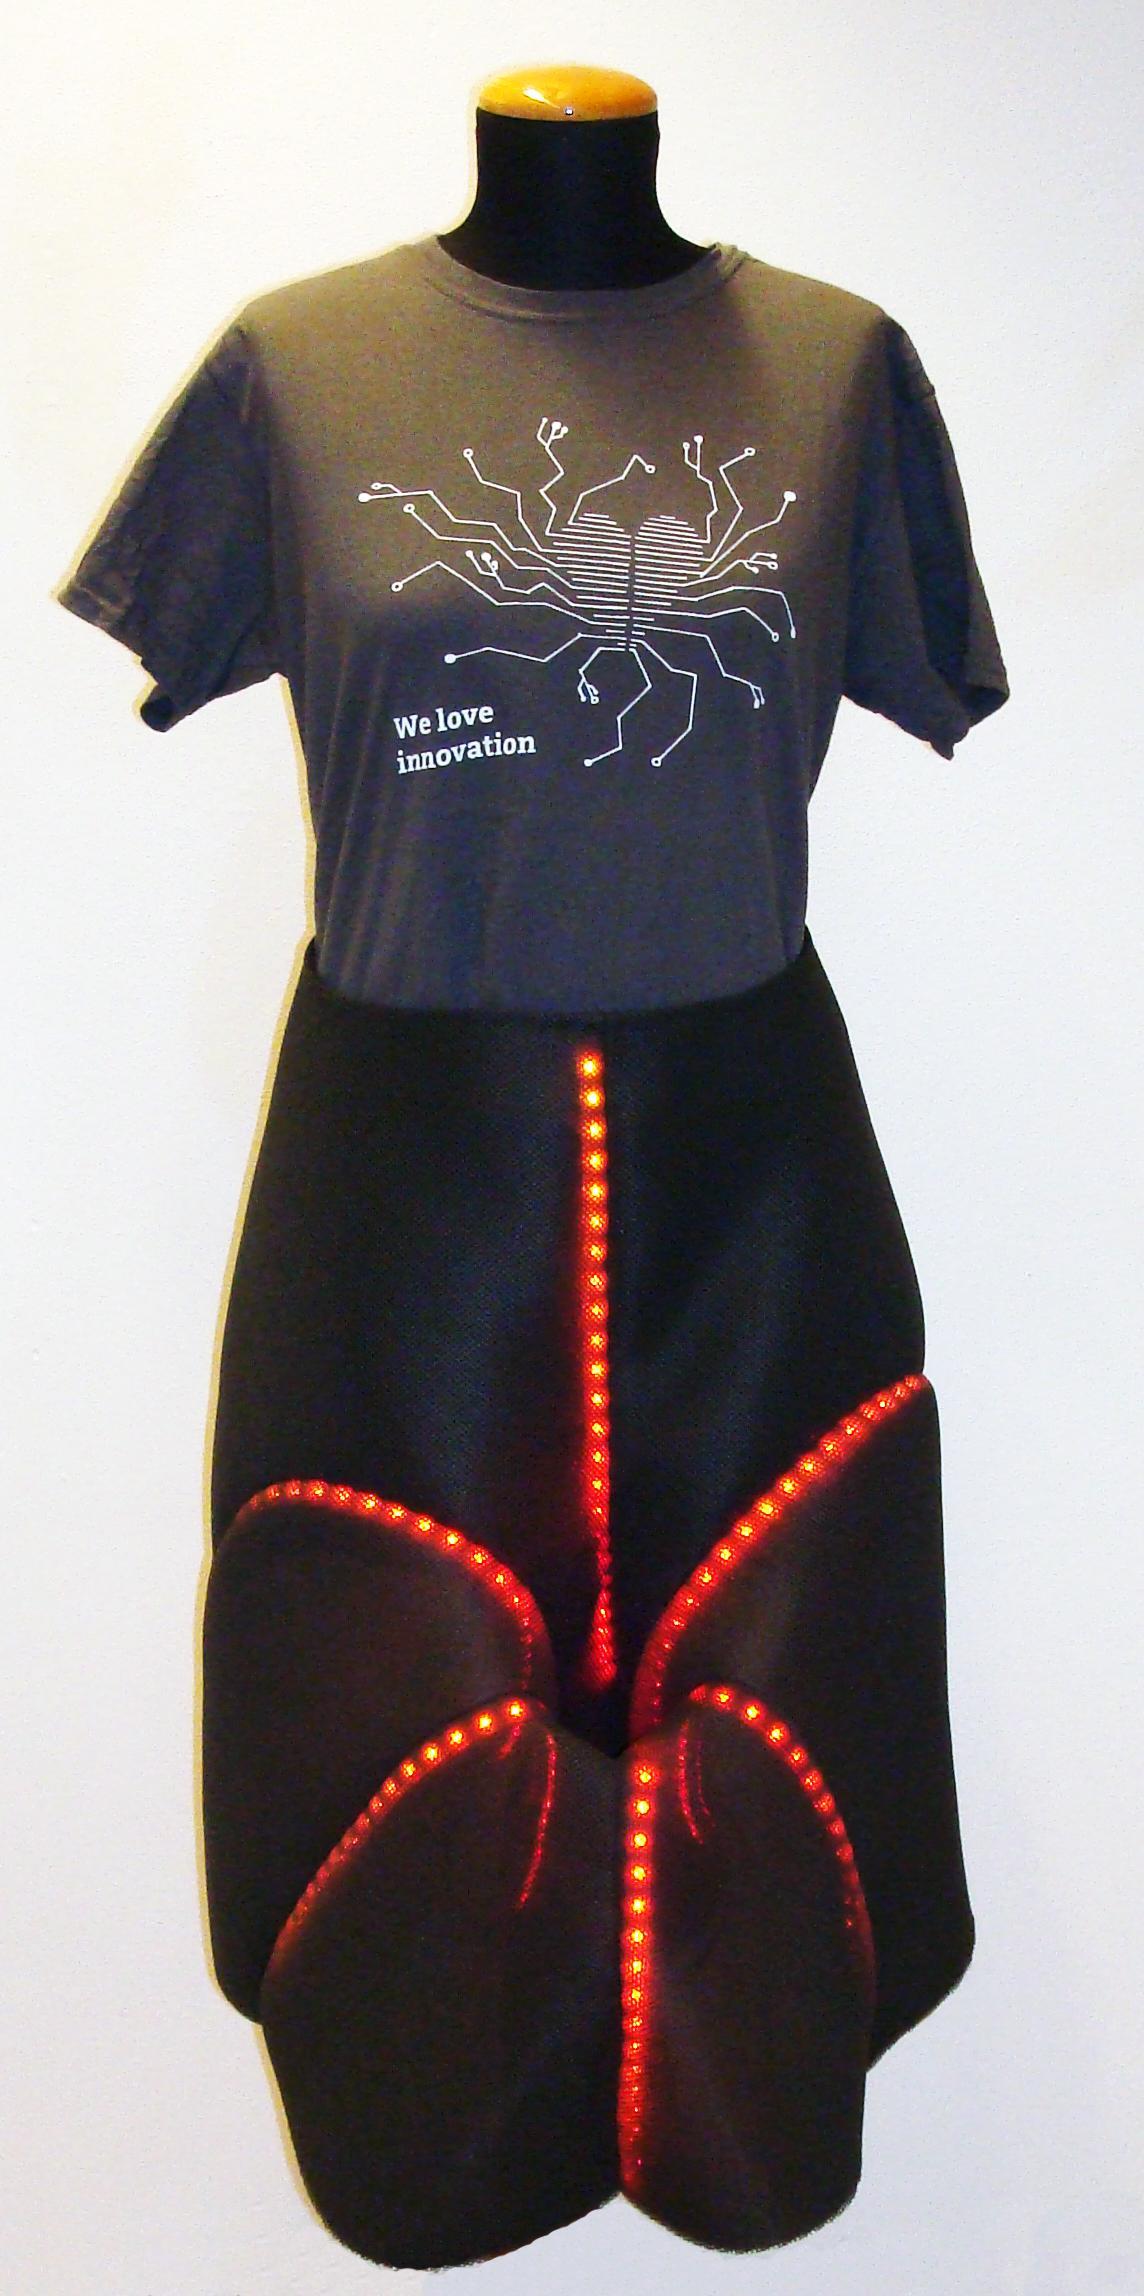 Fashion Fablab's clothes